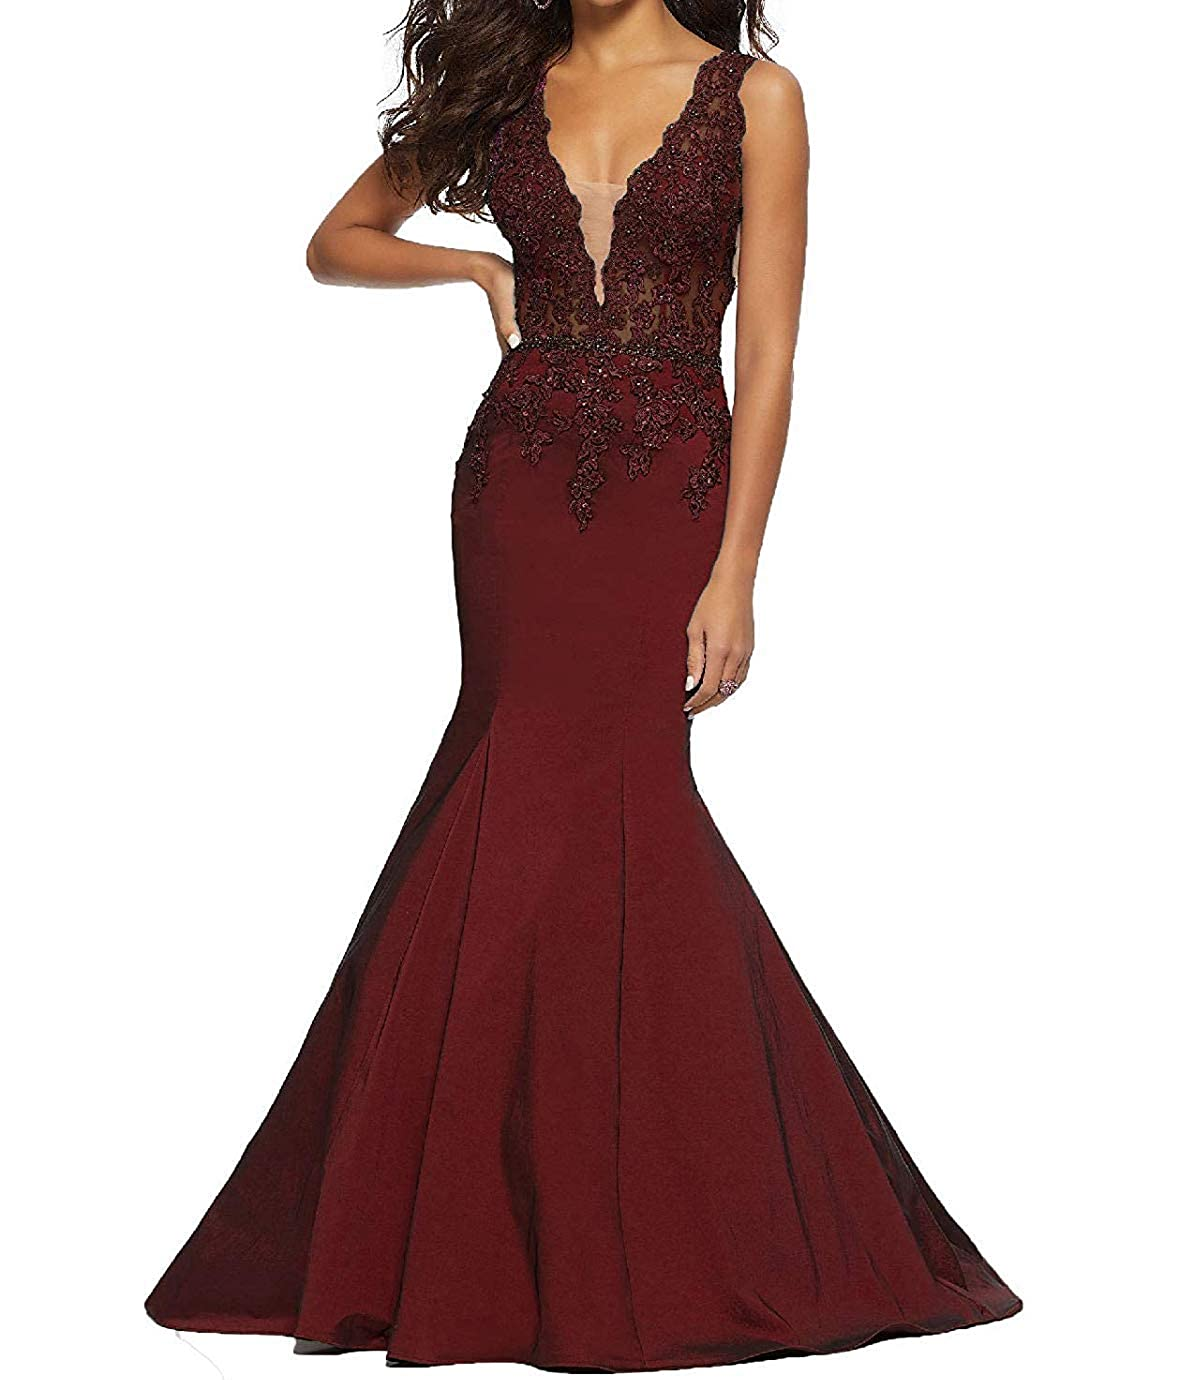 Burgundy tutu.vivi Women's 2019 VNeck Appliques Mermaid Prom Dresses Long Beaded Evening Ball Gown